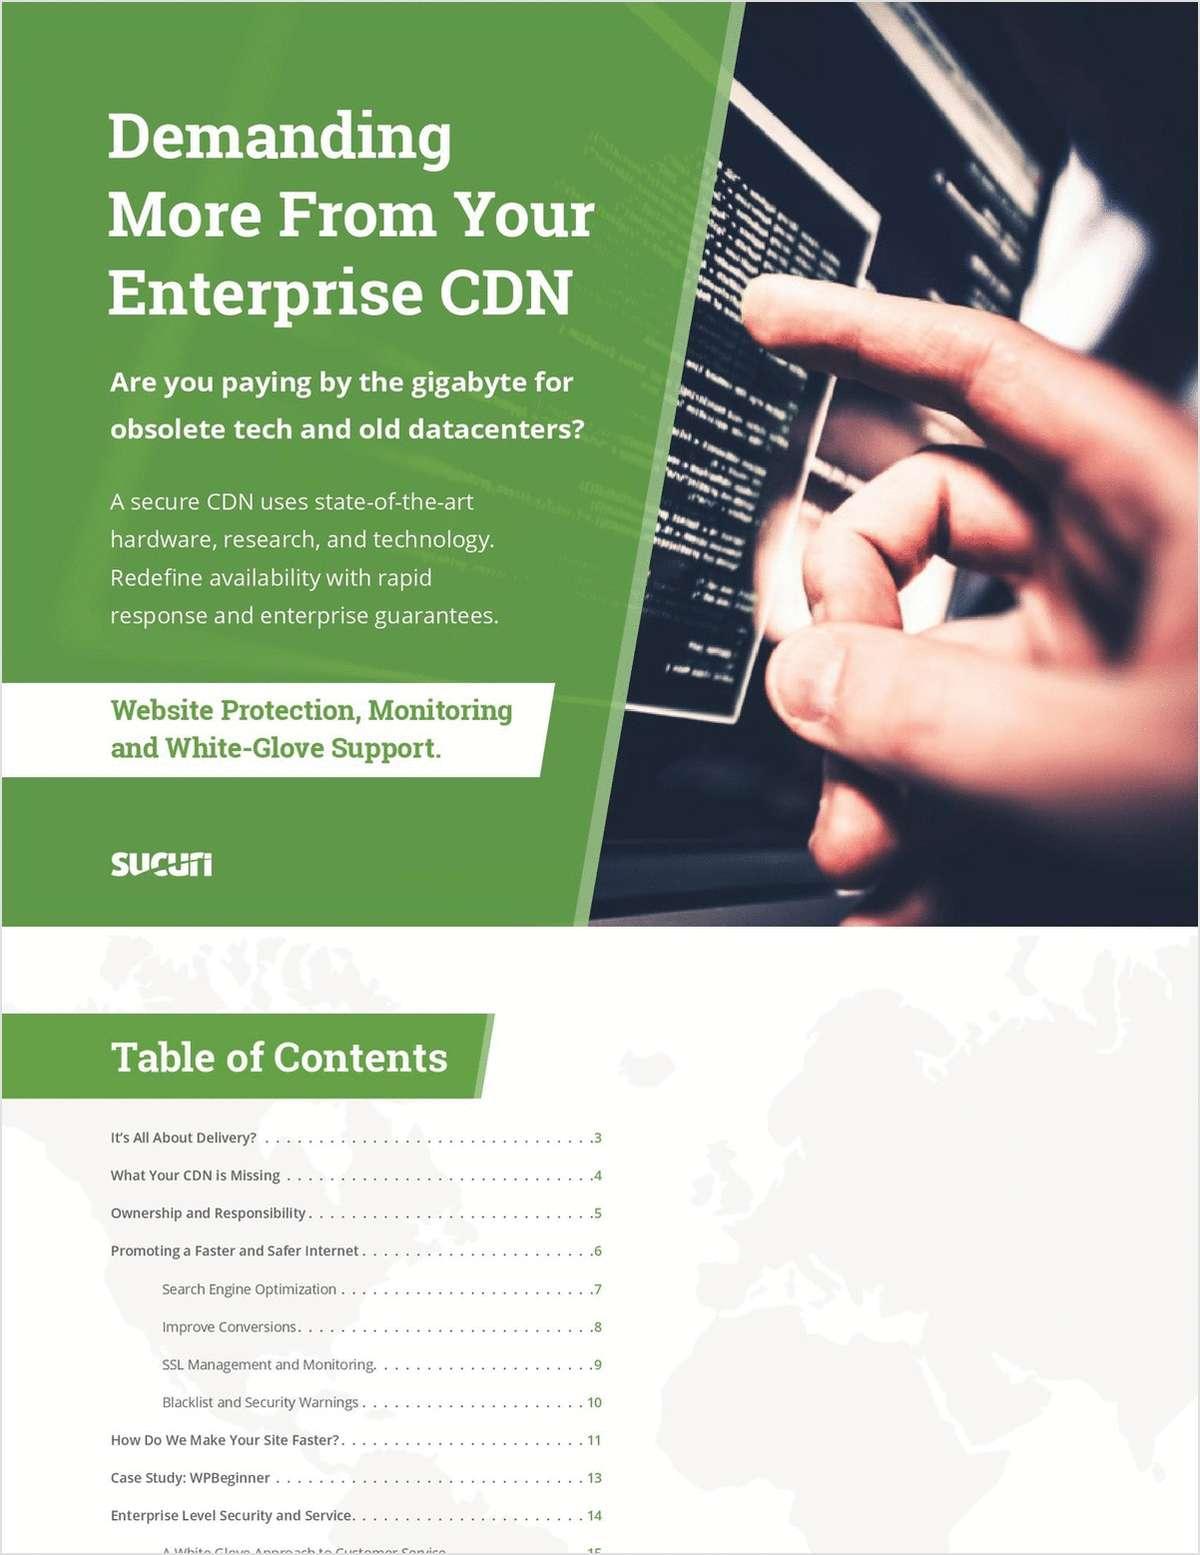 Demand More From Your Enterprise CDN